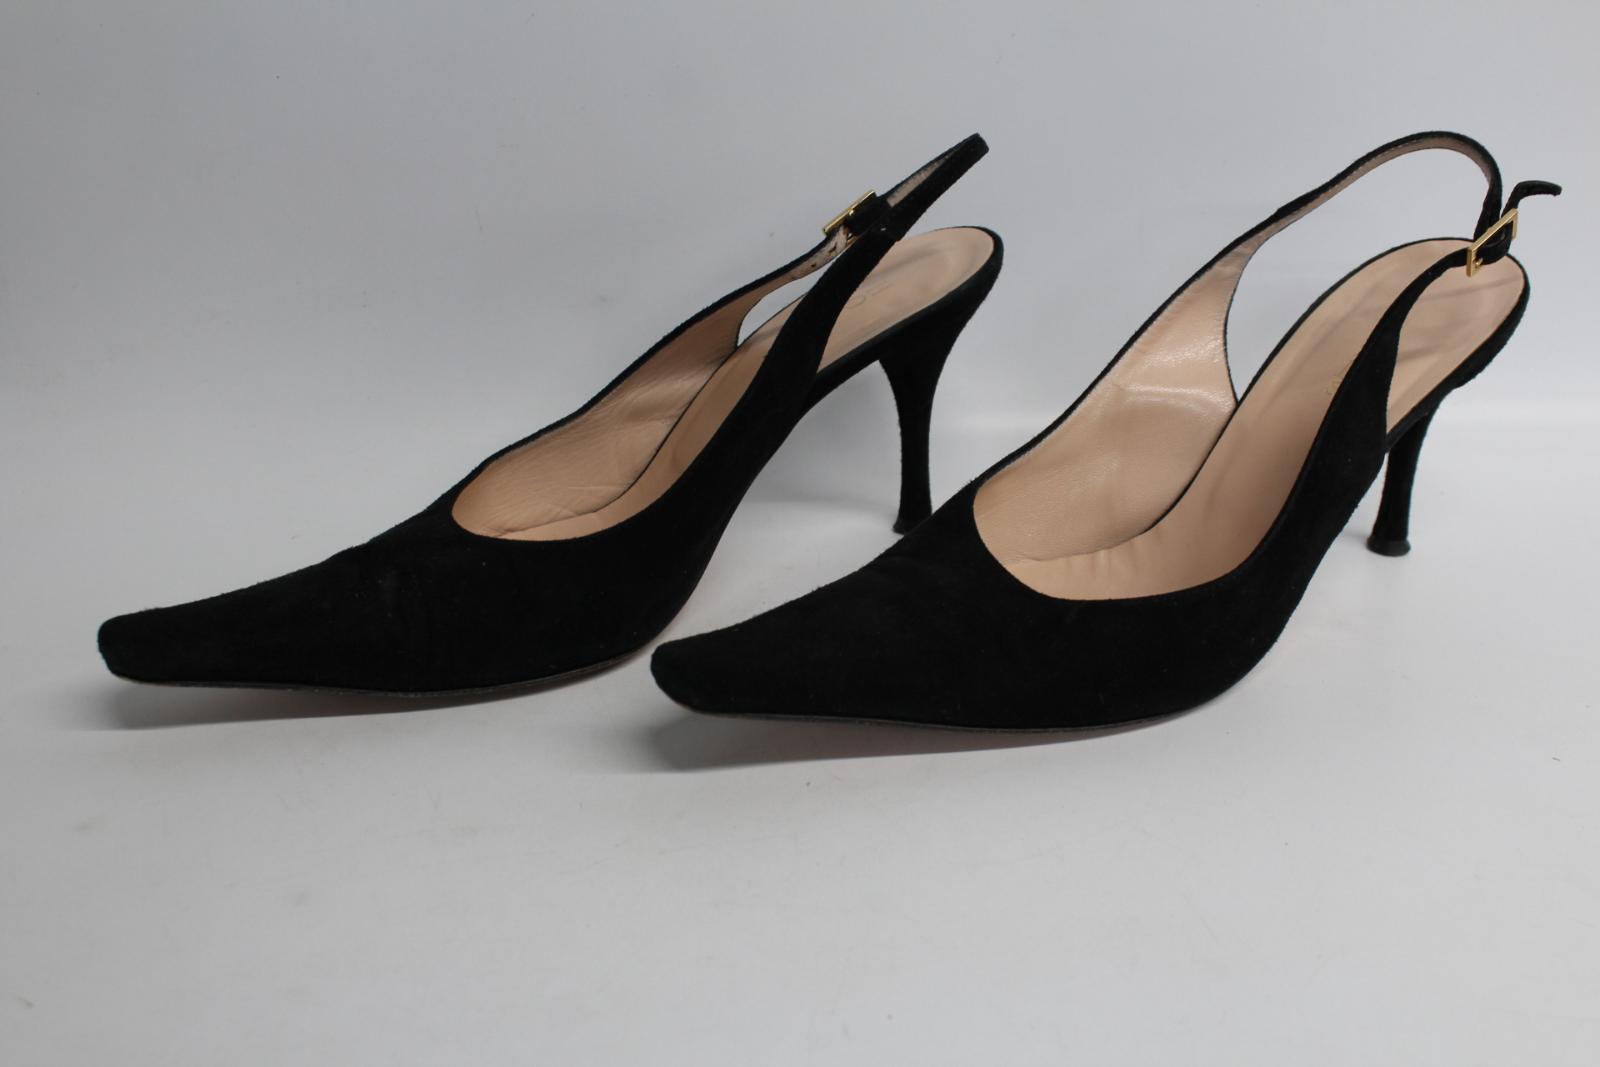 Hobbs-femmes-en-daim-noir-Sling-Arriere-bout-pointu-et-talon-aiguille-Chaussure-UK6-5-EU39-5 miniature 3